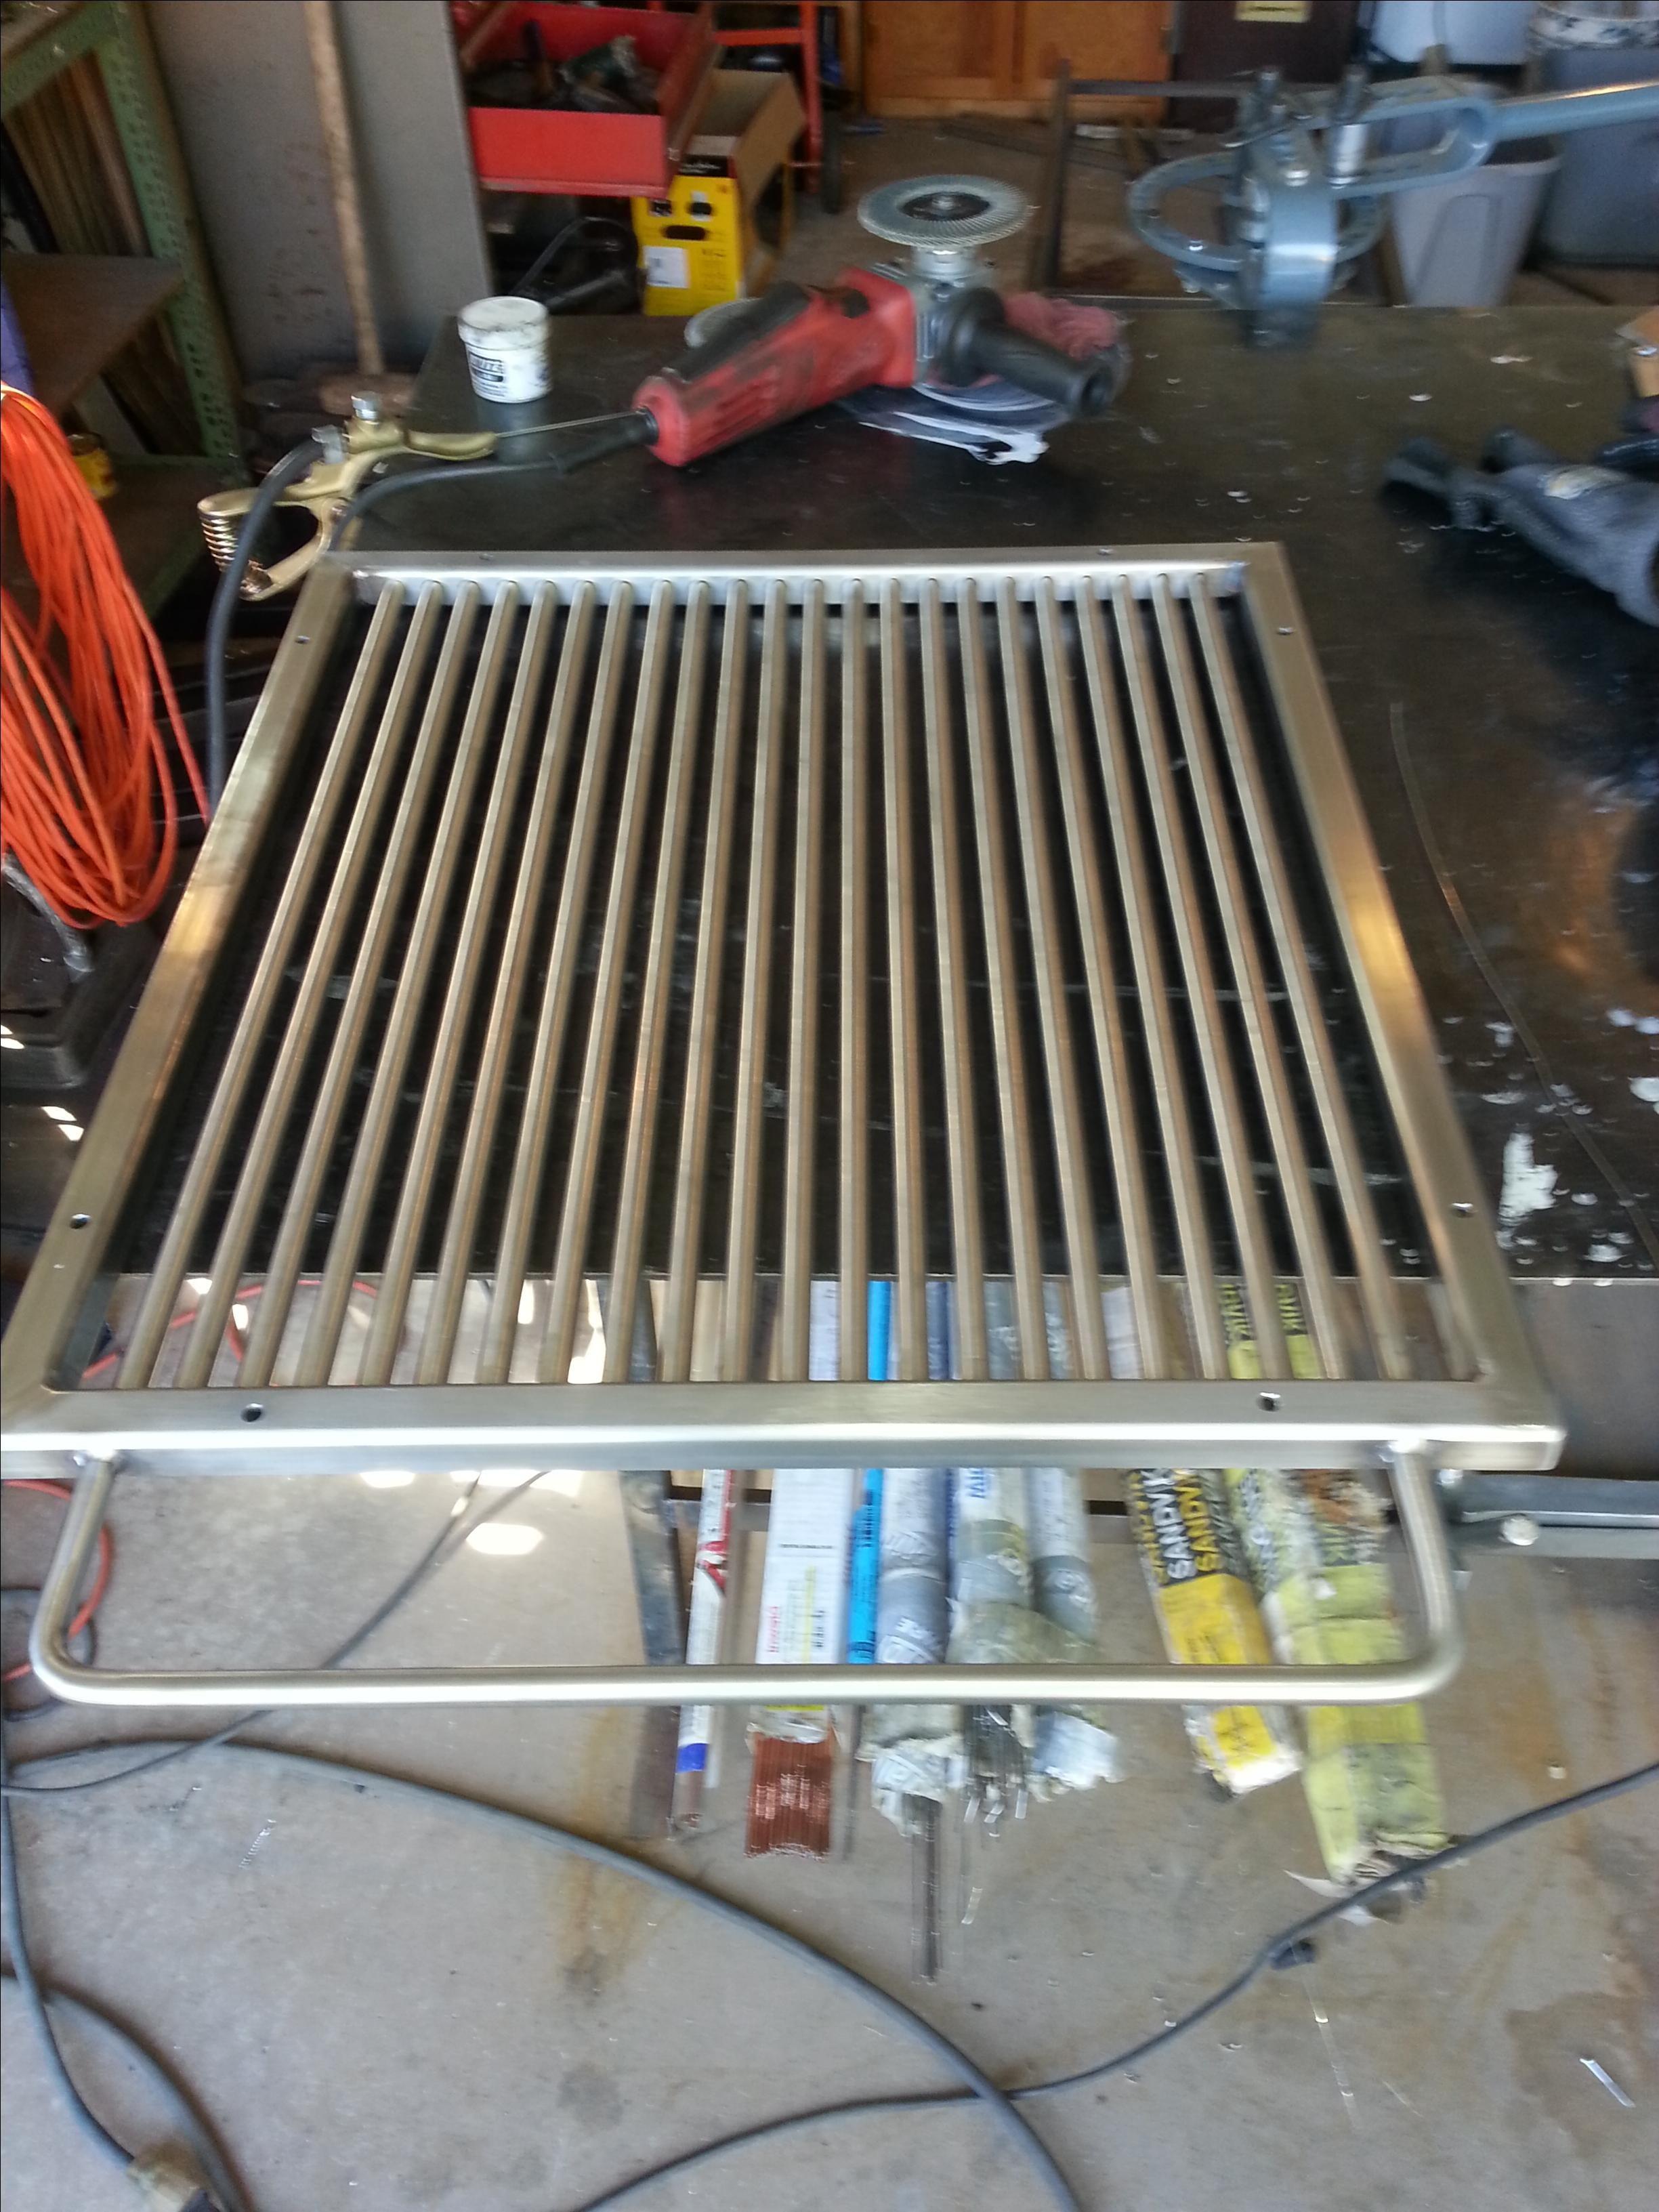 wid grill roadtrip grate coleman rack hei cast swaptop iron